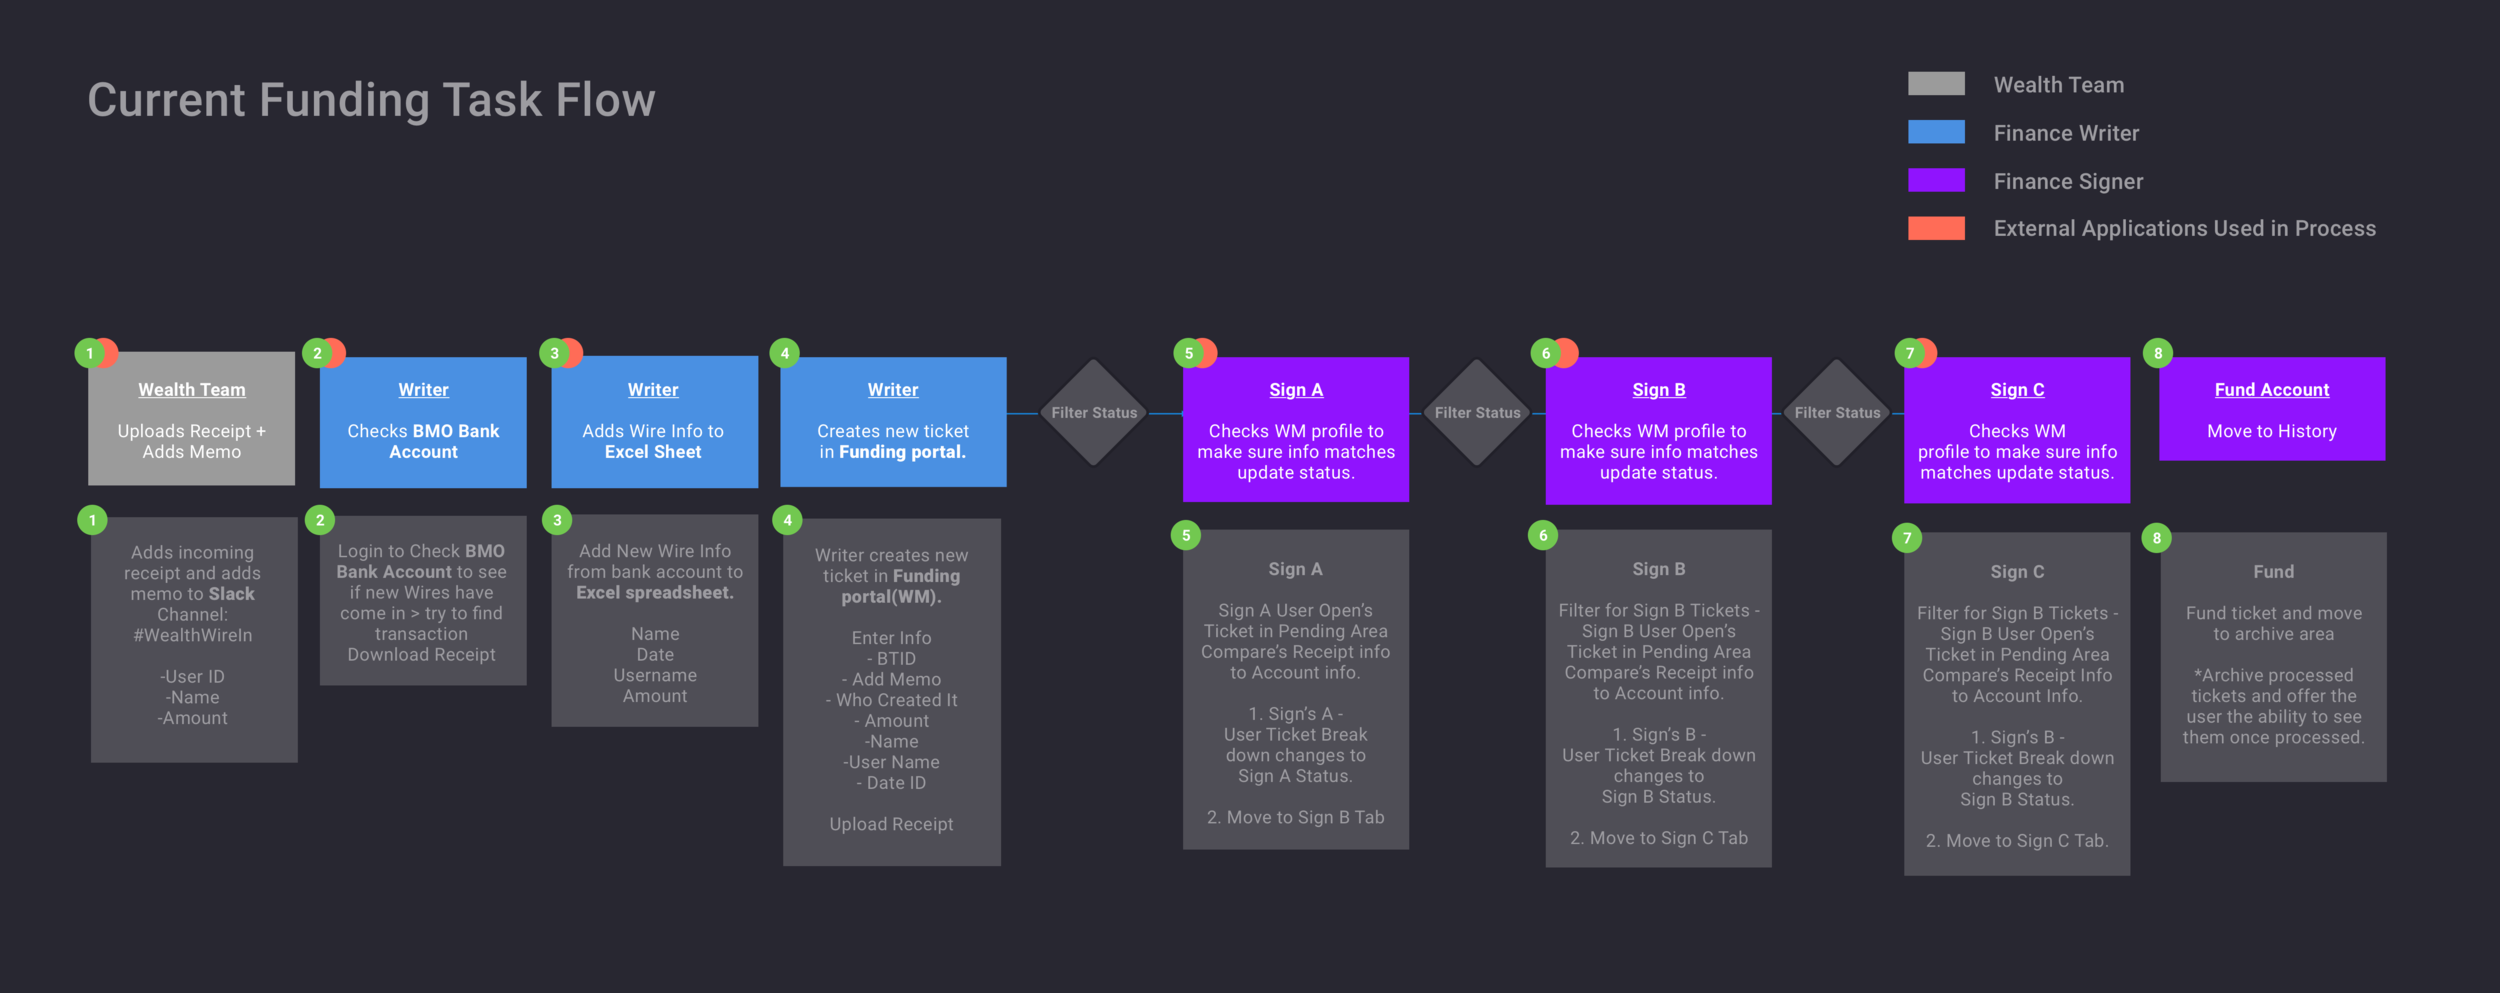 Current Task Flow_Portfolio@3x.png